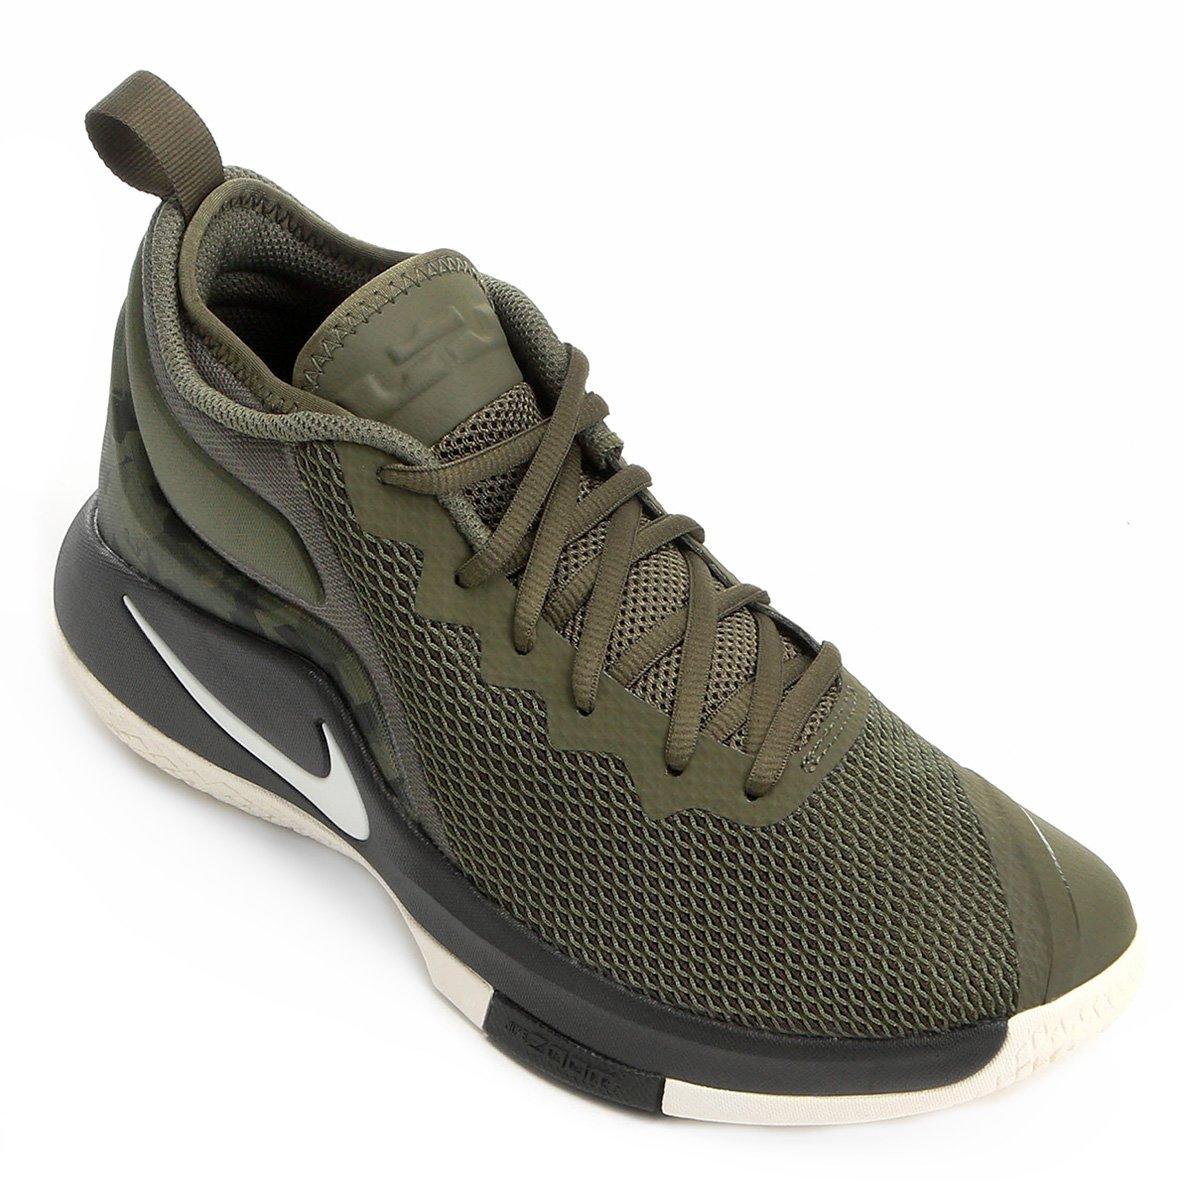 Tênis Nike Lebron James Witness II Masculino - Compre Agora  7e0cab61e3b